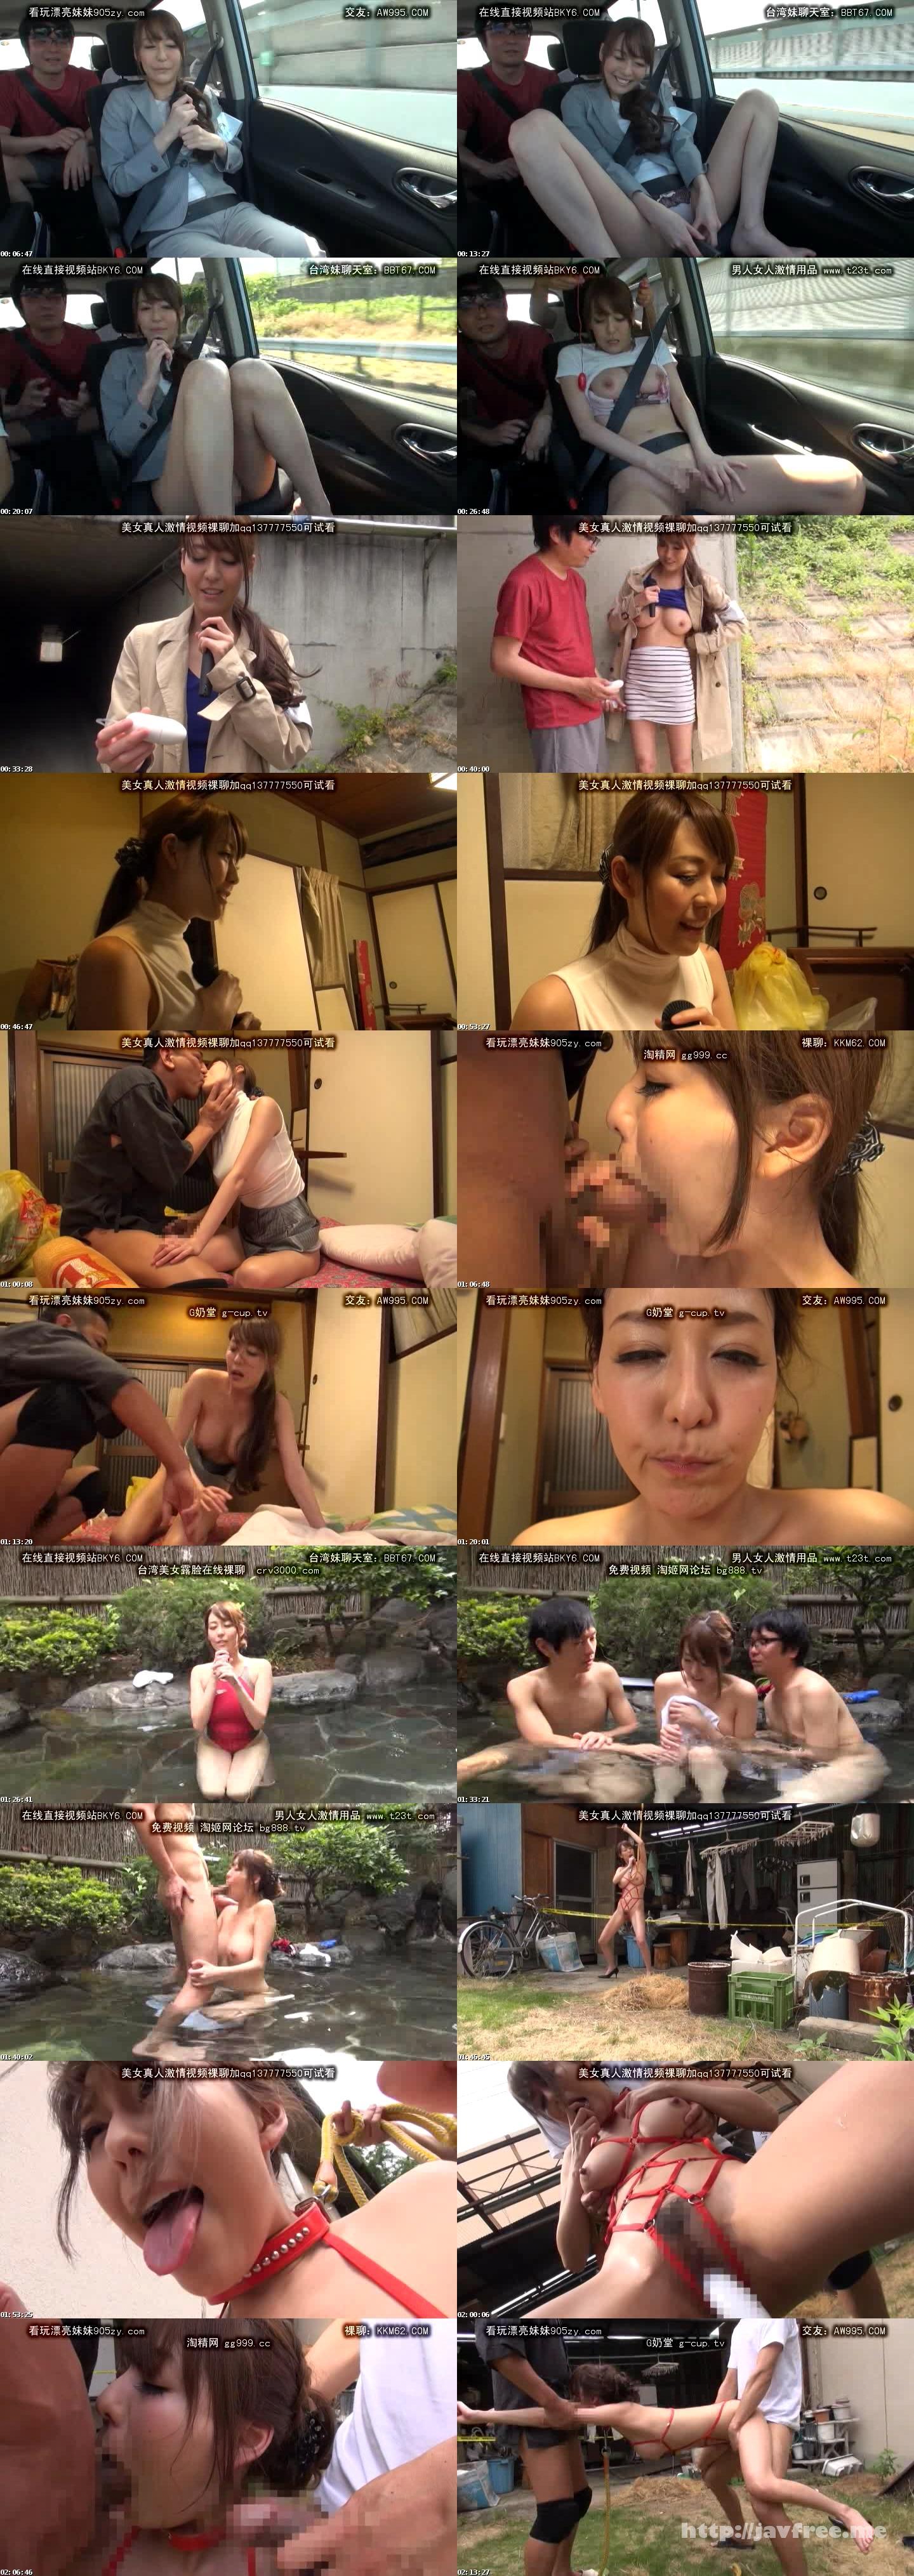 [SORA 081] 新人女子アナ初めての野外ロケ 朝桐光 朝桐光 SORA